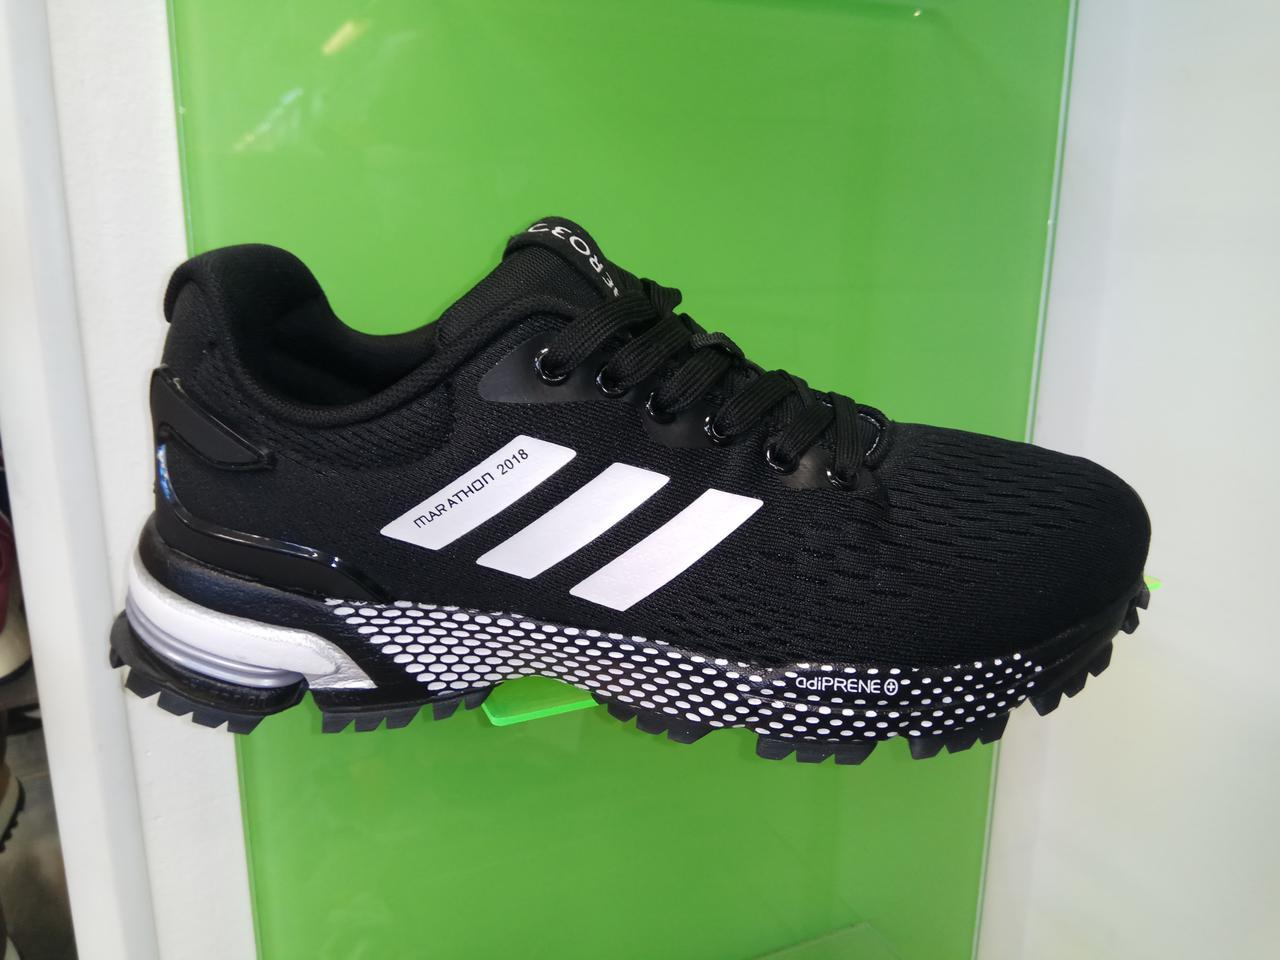 Мужские кроссовки Adidas Marathon 2018 black white - Интернет магазин  krossovkiweb.kiev.ua в 7813fe4ae7a